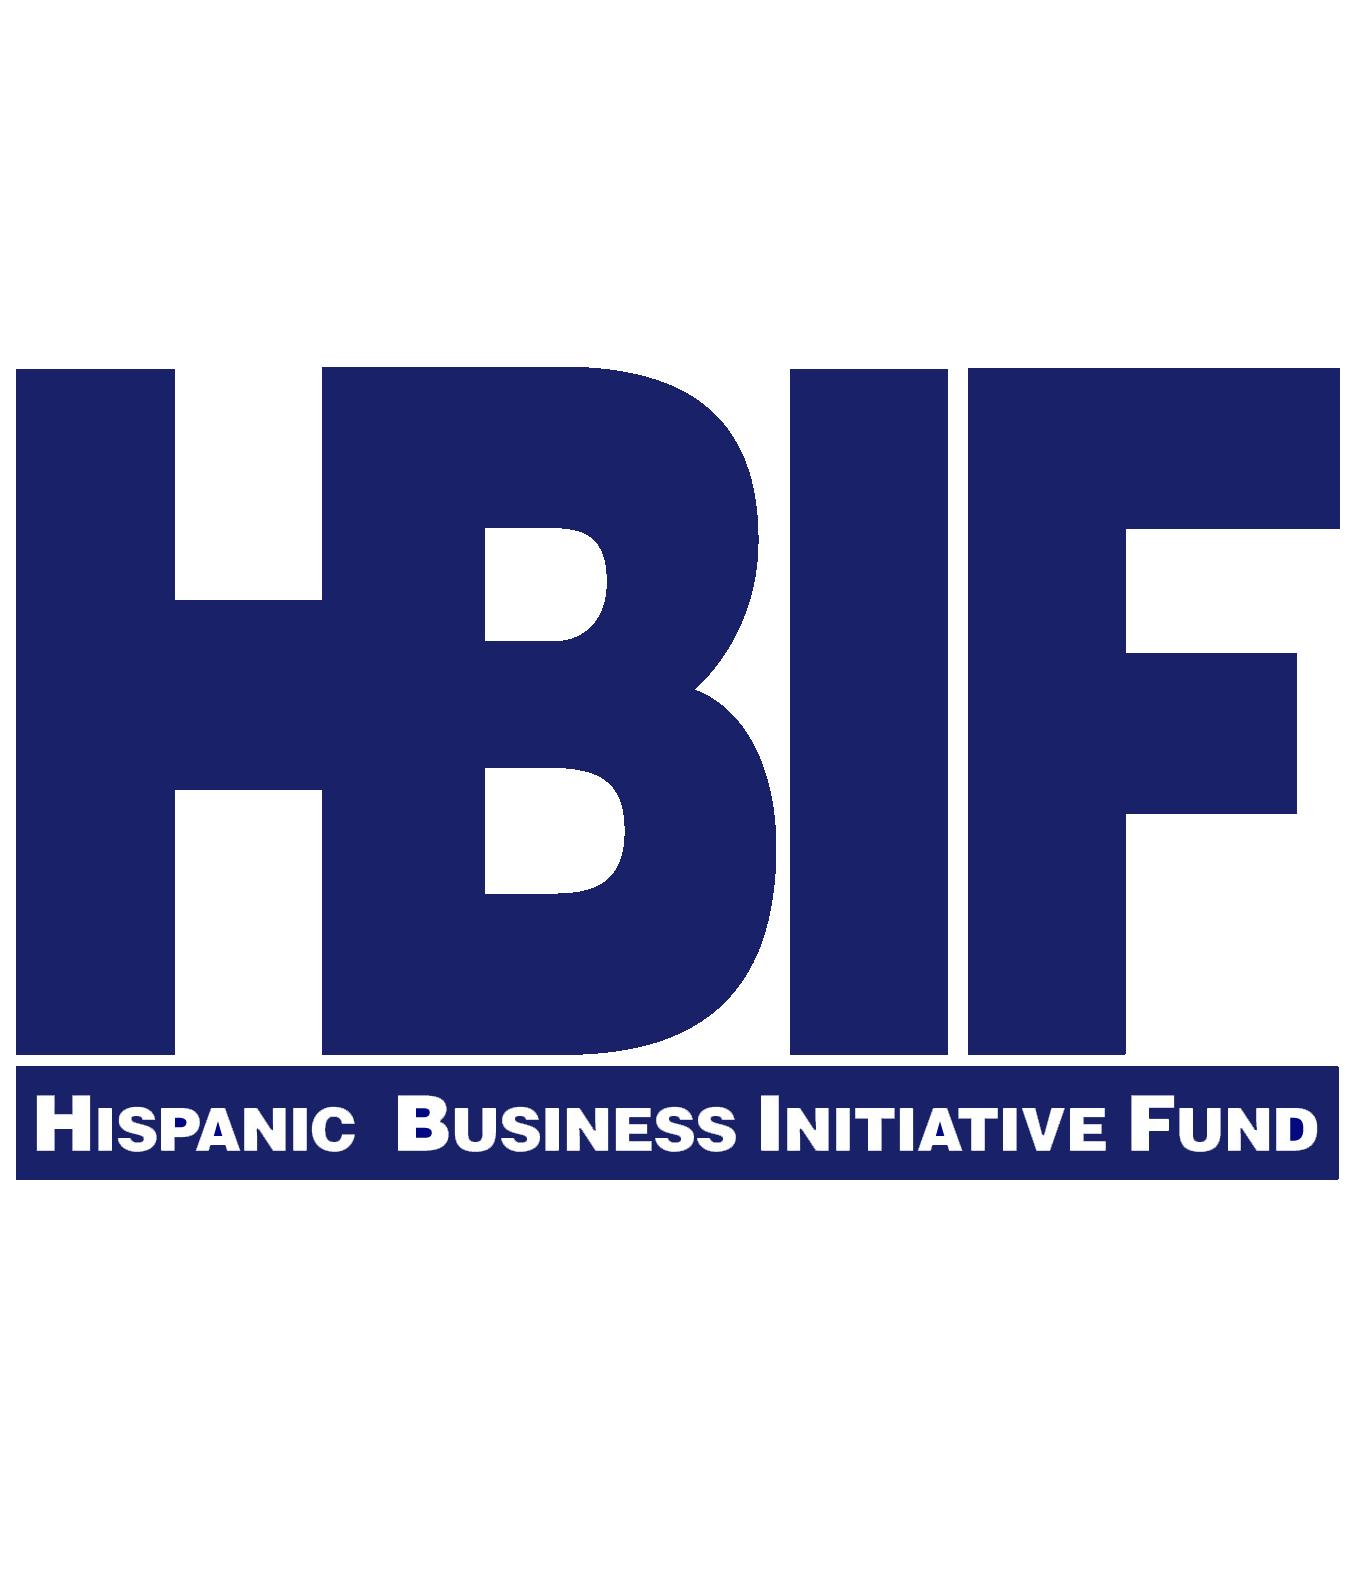 Hispanic Business Investment Fund